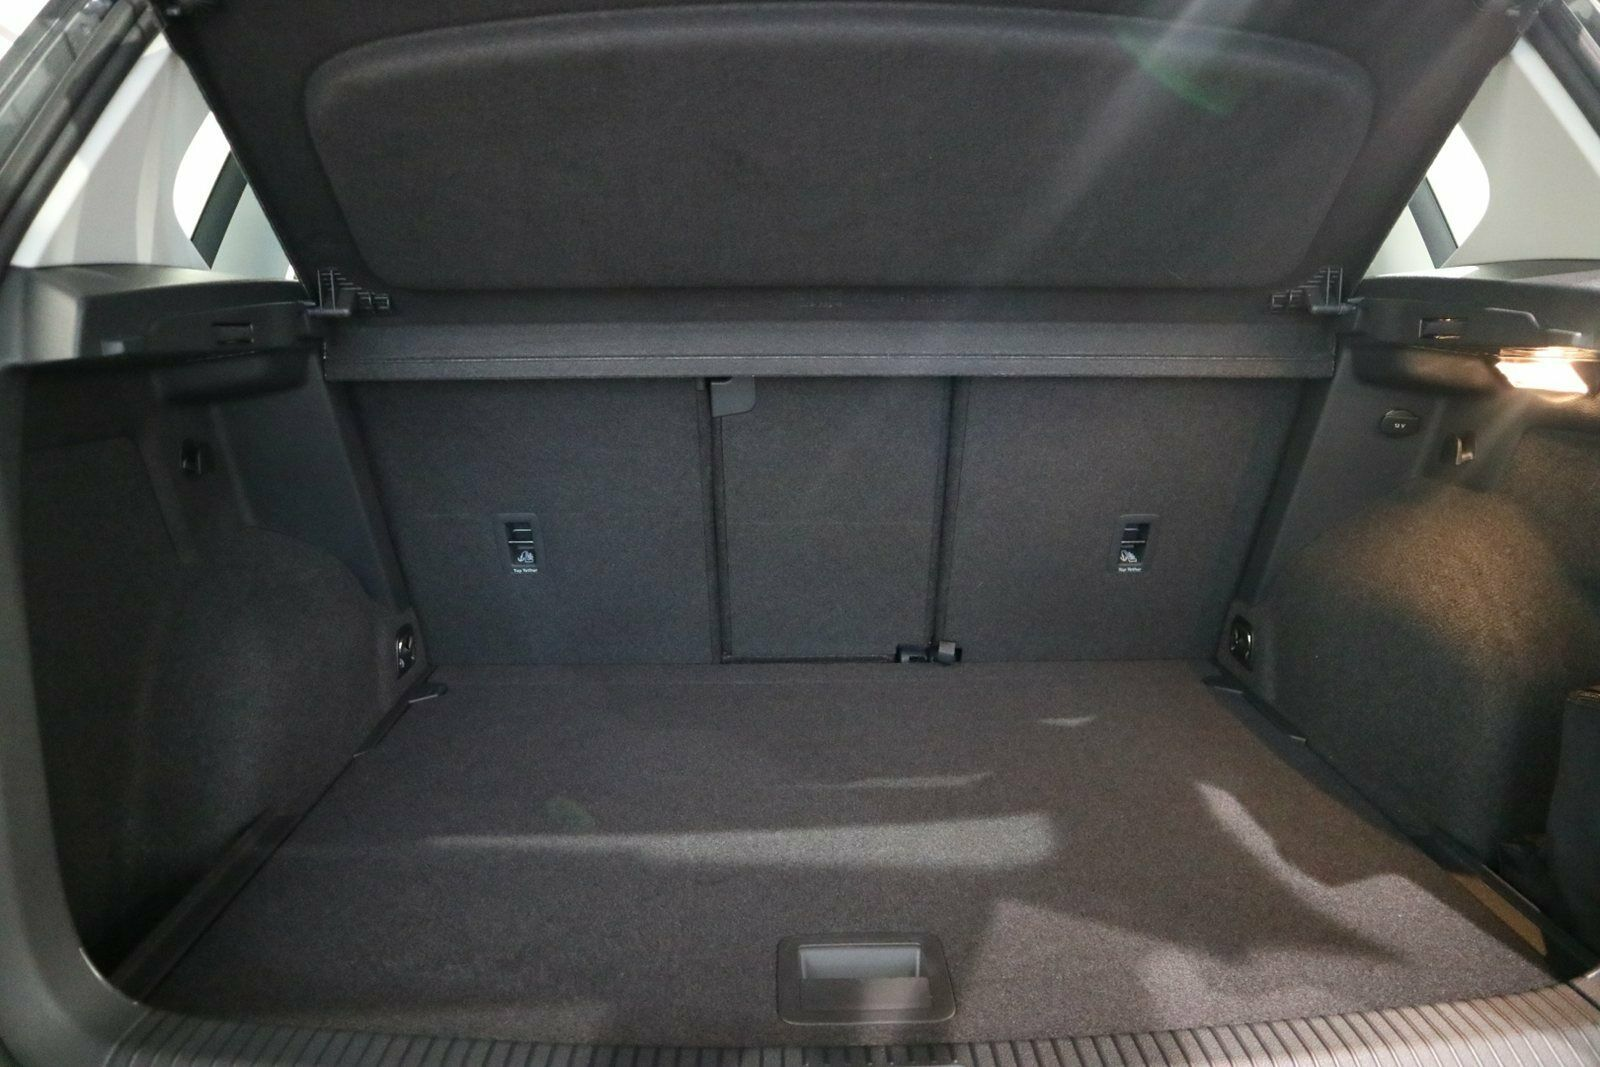 VW Golf Sportsvan 1,6 TDi 115 Comfortline DSG - billede 12